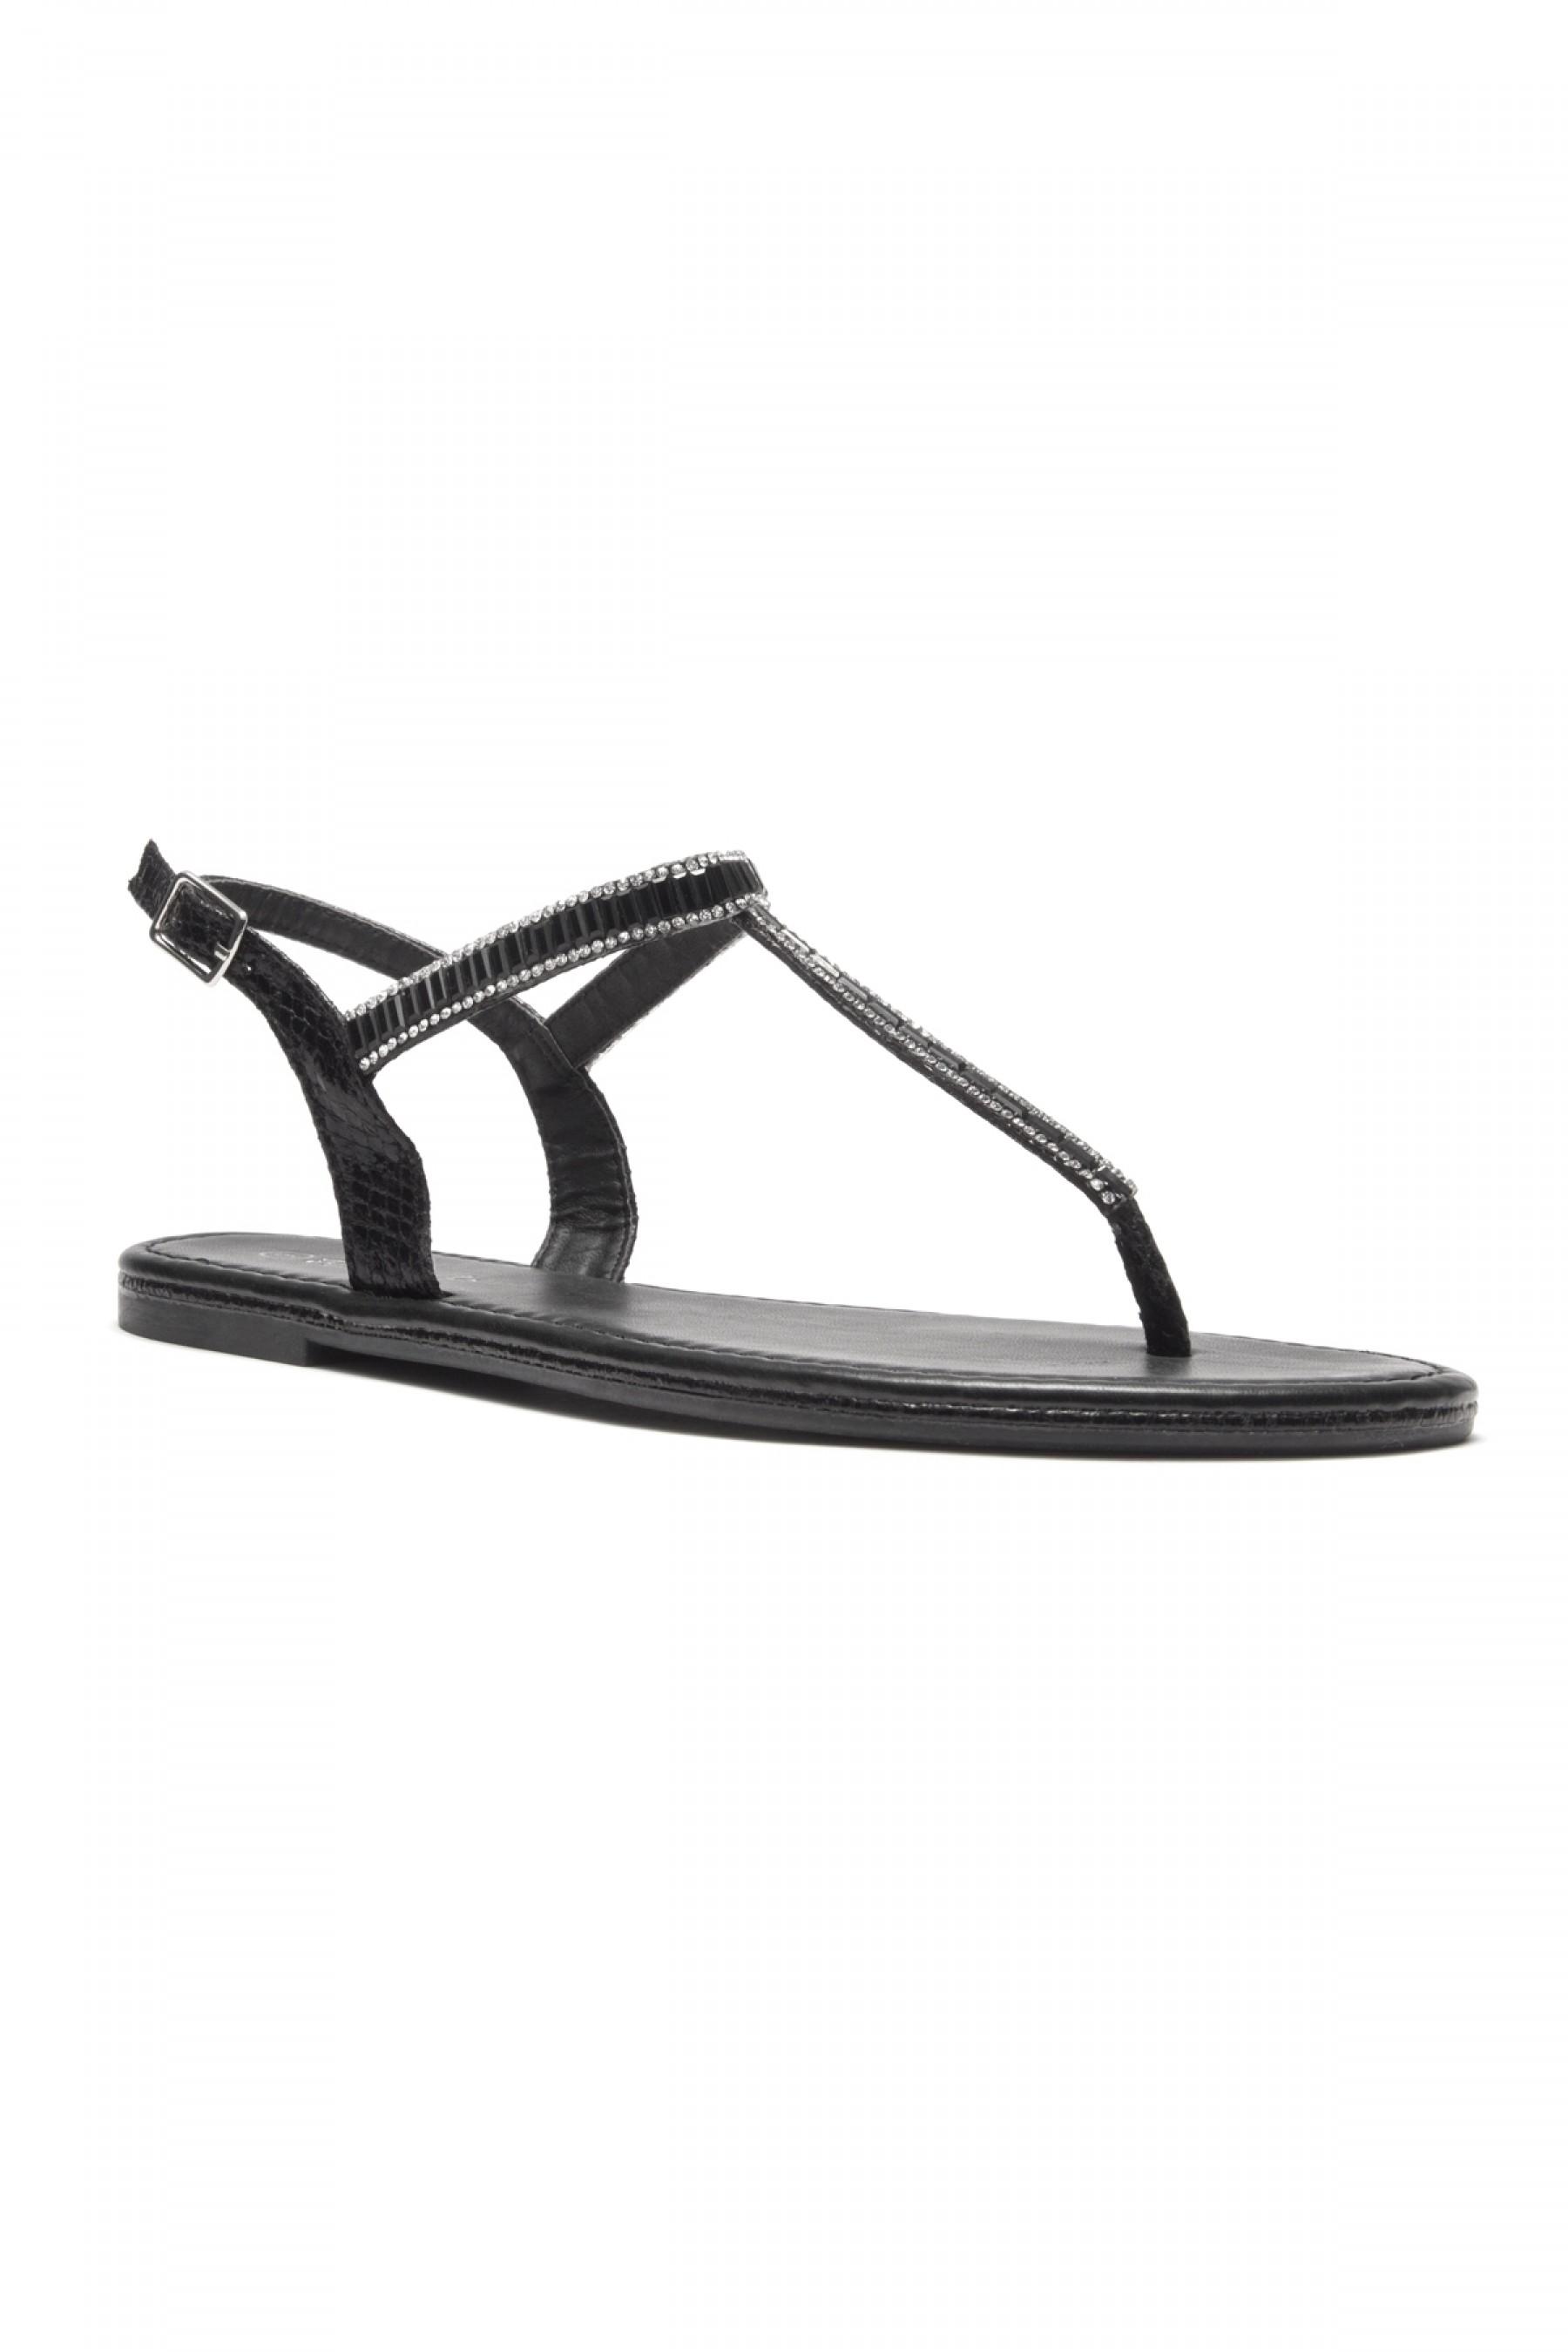 HerStyle Gammee Metallic Rhinestone Thong Flat Sandal (Black)